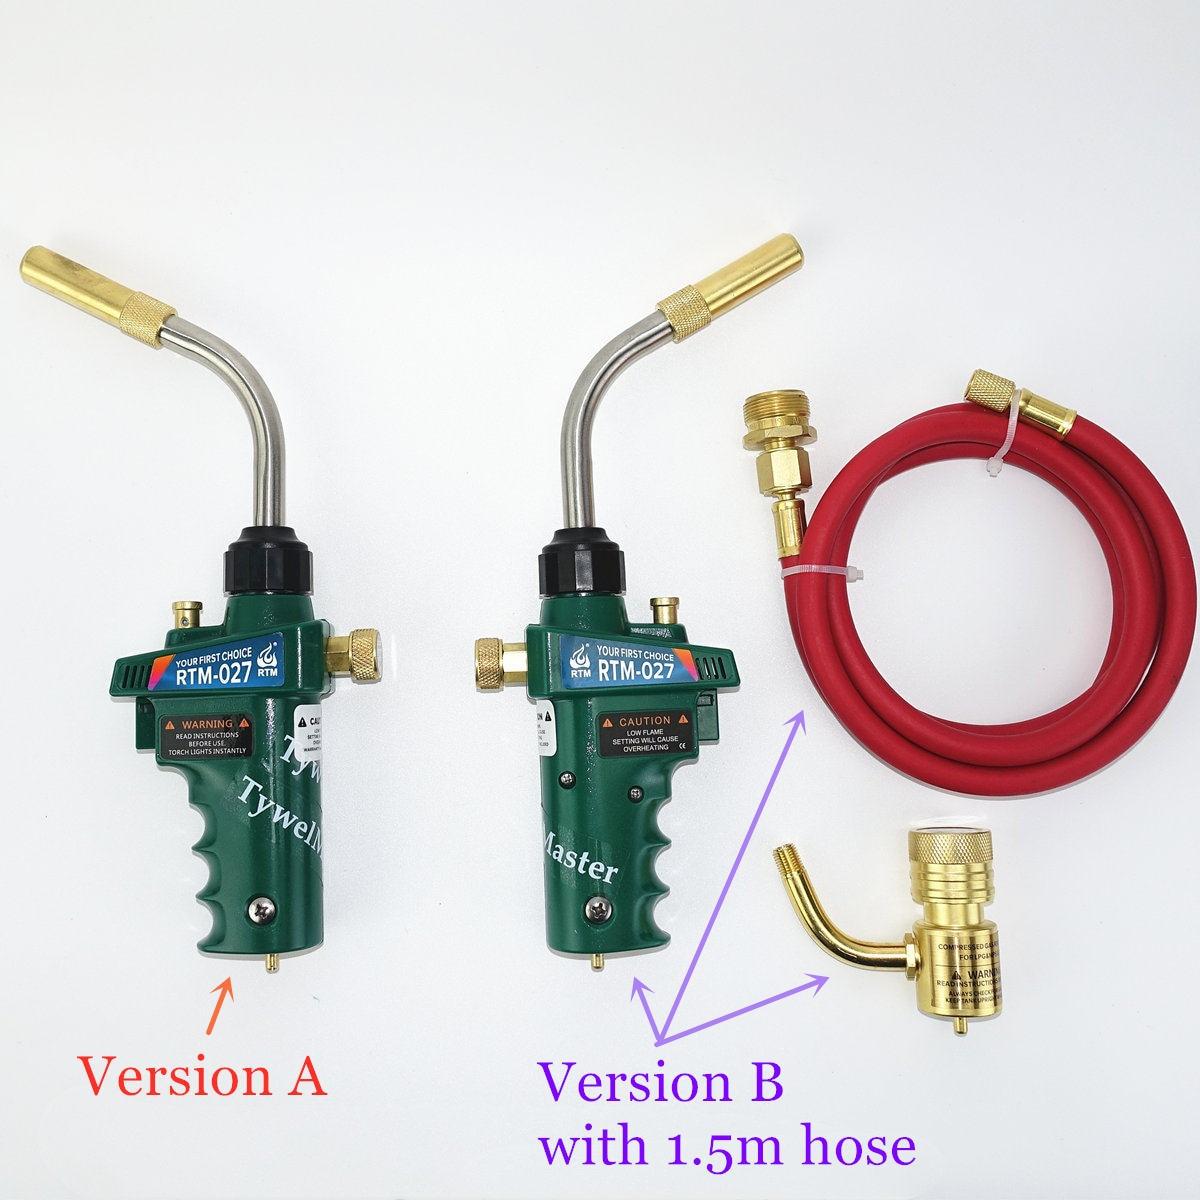 Professional Mapp Torch Piezo Ignition Gas Flame Brazing Tool 1 5m Hose CGA600 BBQ Heating Quenching HVAC Plumbing Welding Torch